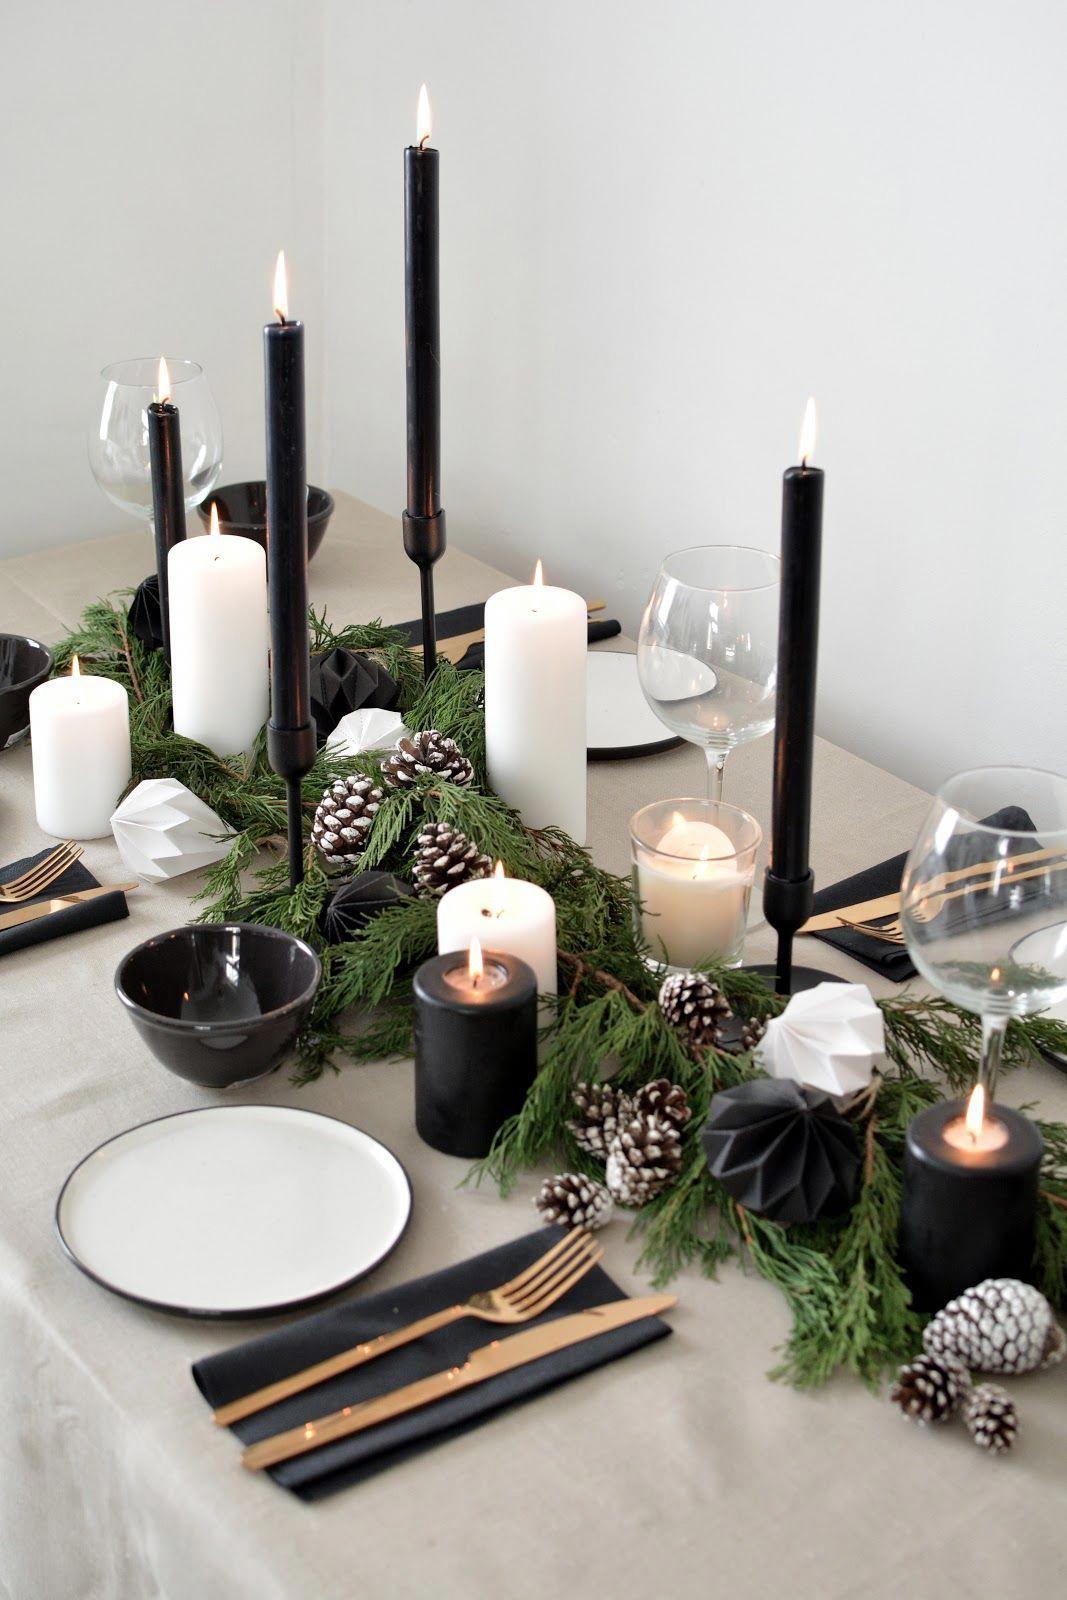 Christmas Decorations In Bulk Uk Christmas Prince Holiday Table Decorations Scandinavian Christmas Decorations Christmas Table Centerpieces